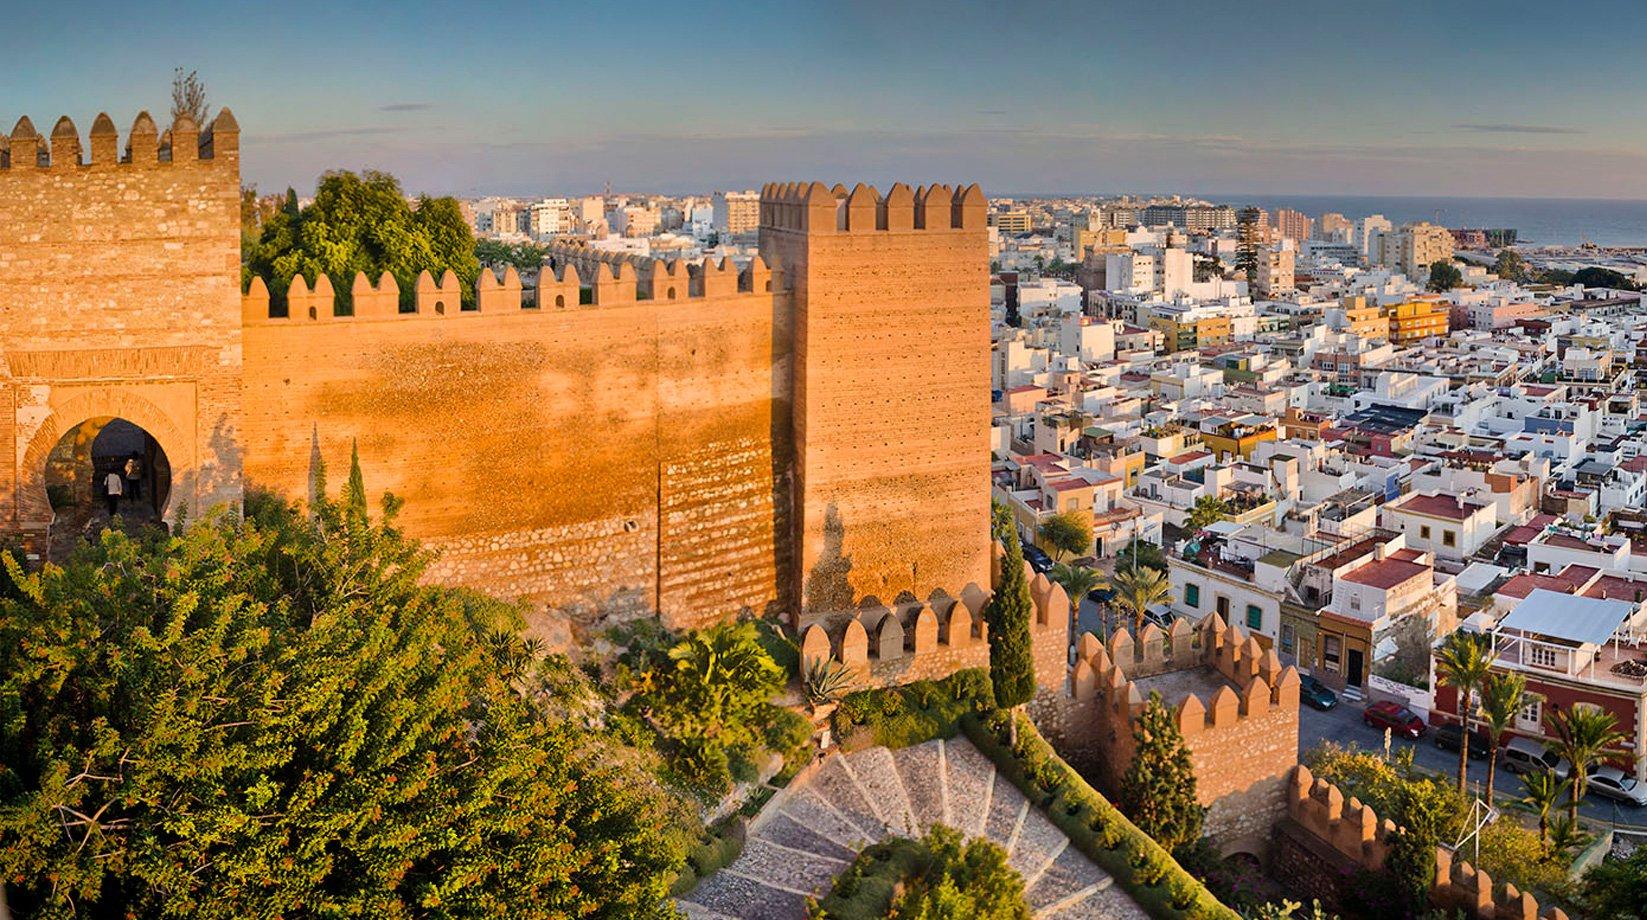 Almer a turismo turismo e informaci n de almer a ciudad for Oficinas unicaja almeria